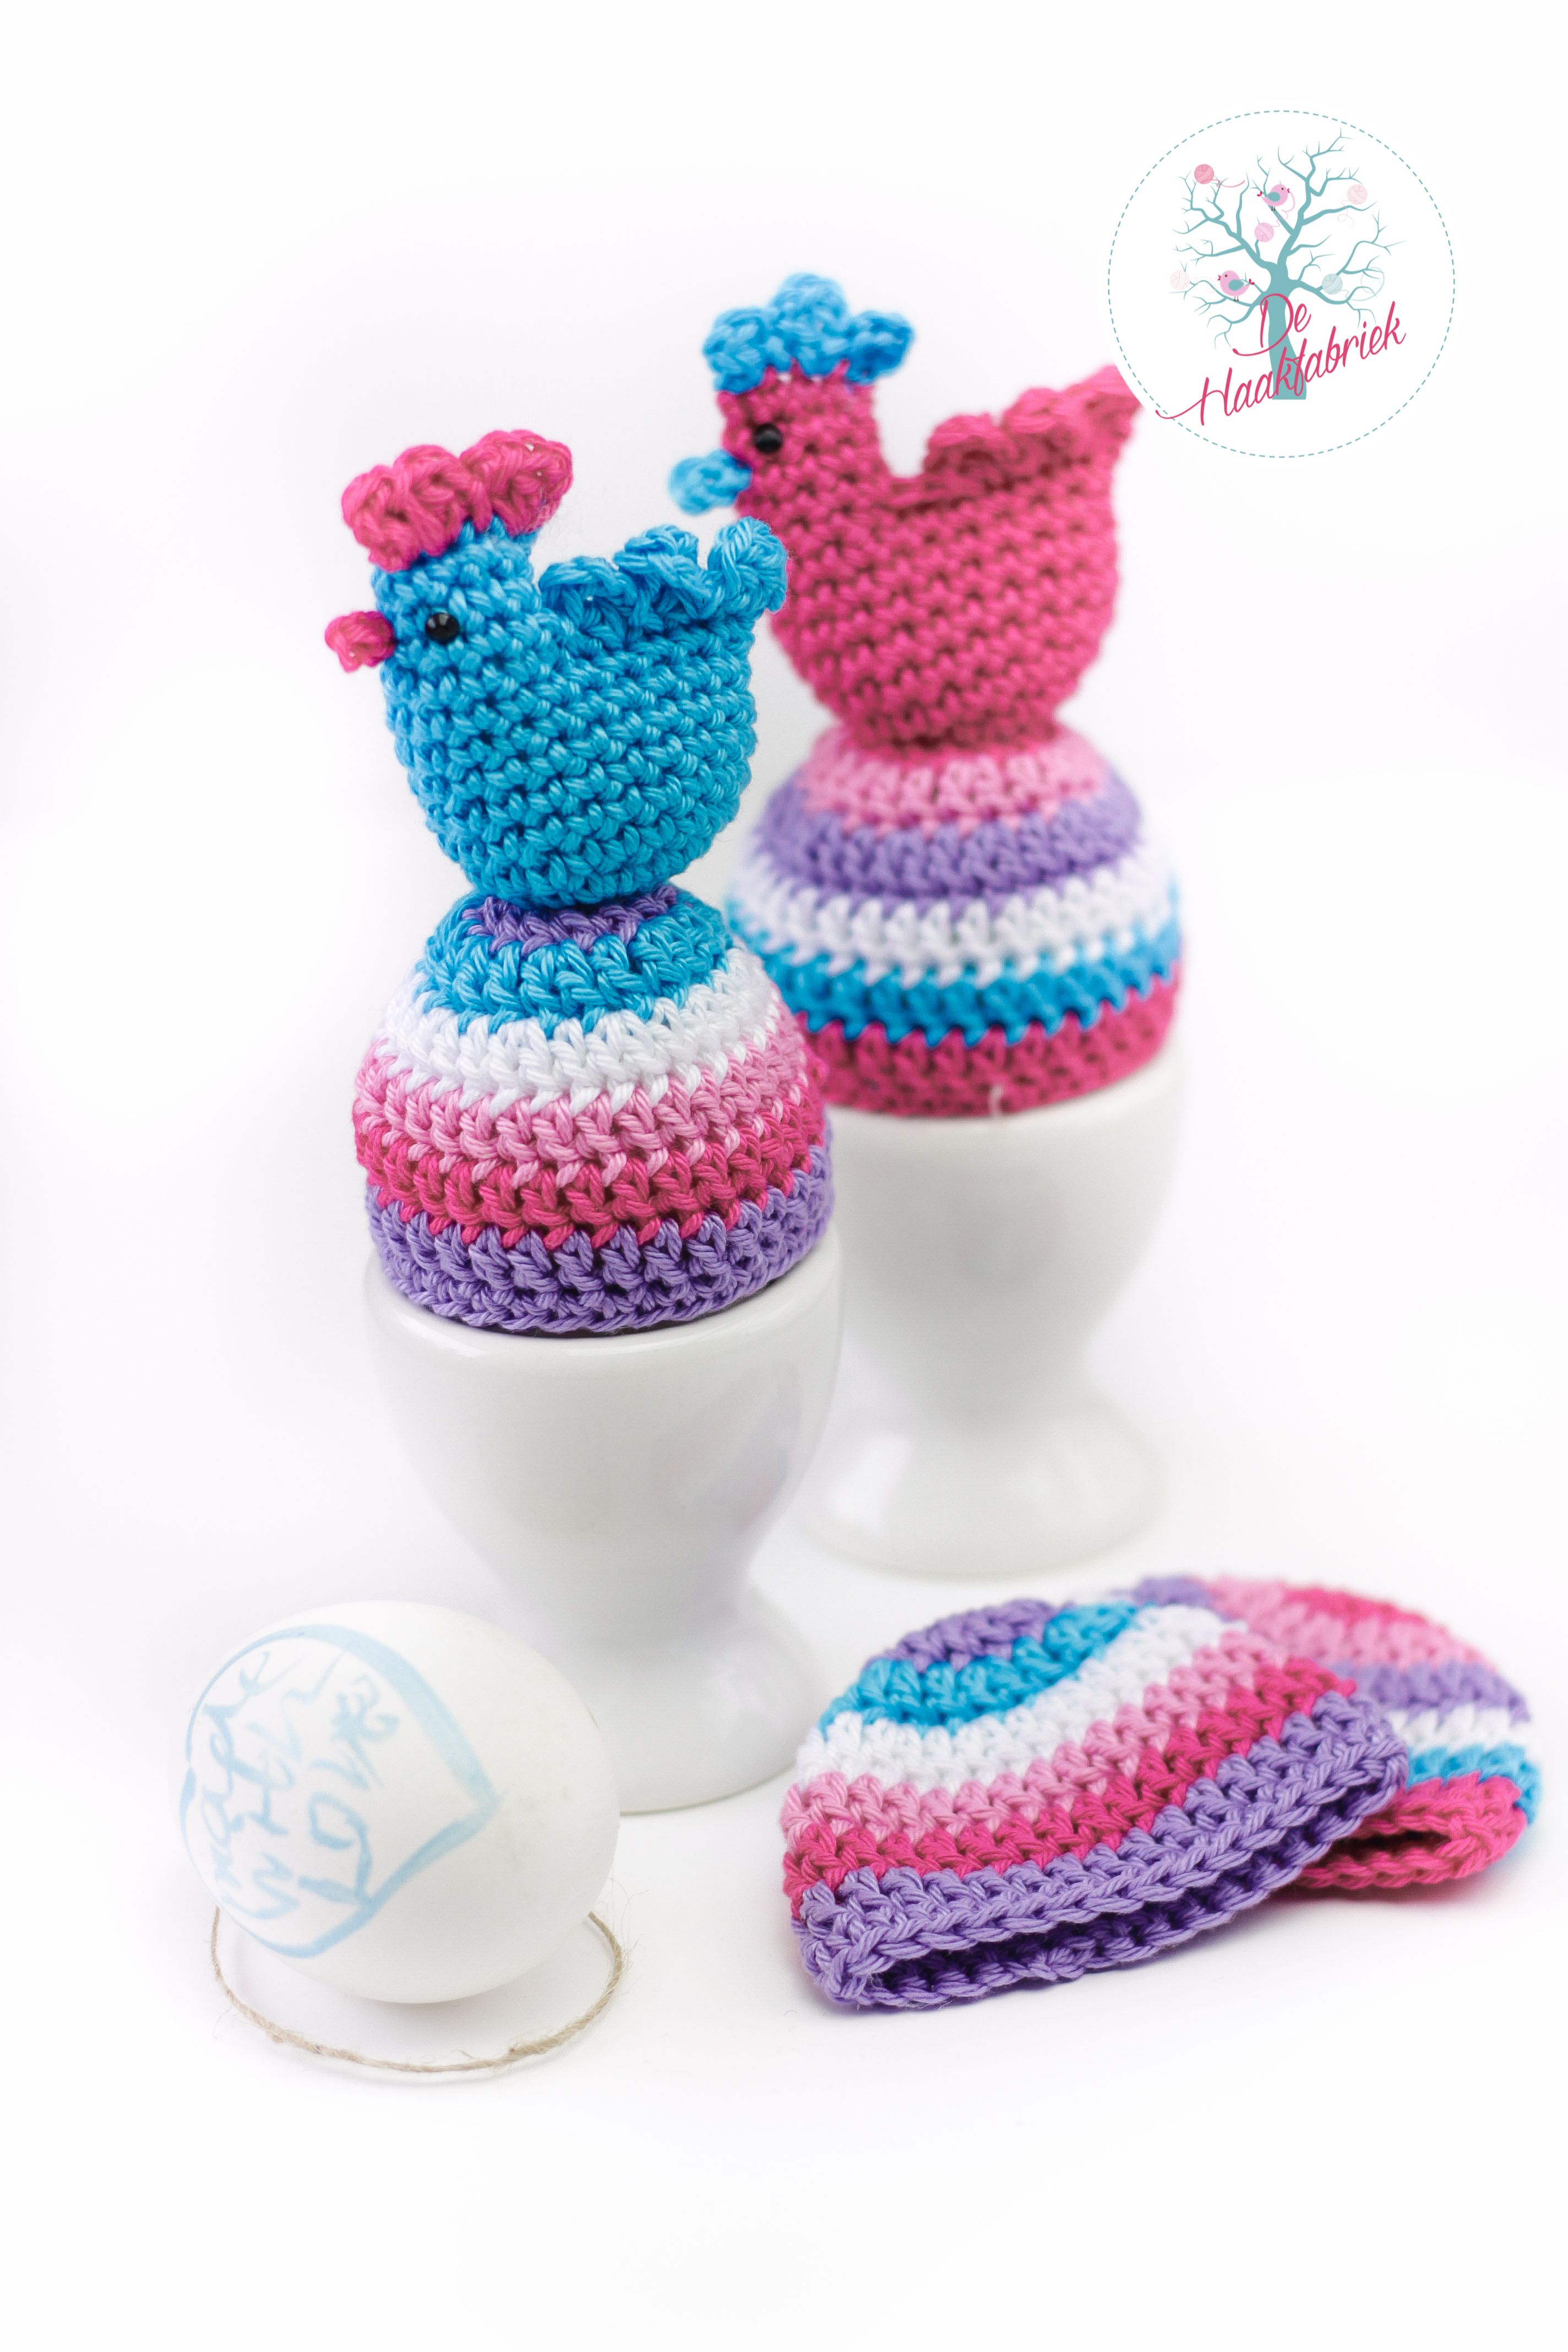 Egg Cozies Happy Easter www.dehaakfabriek.nl | Aegge varmer crochet ...